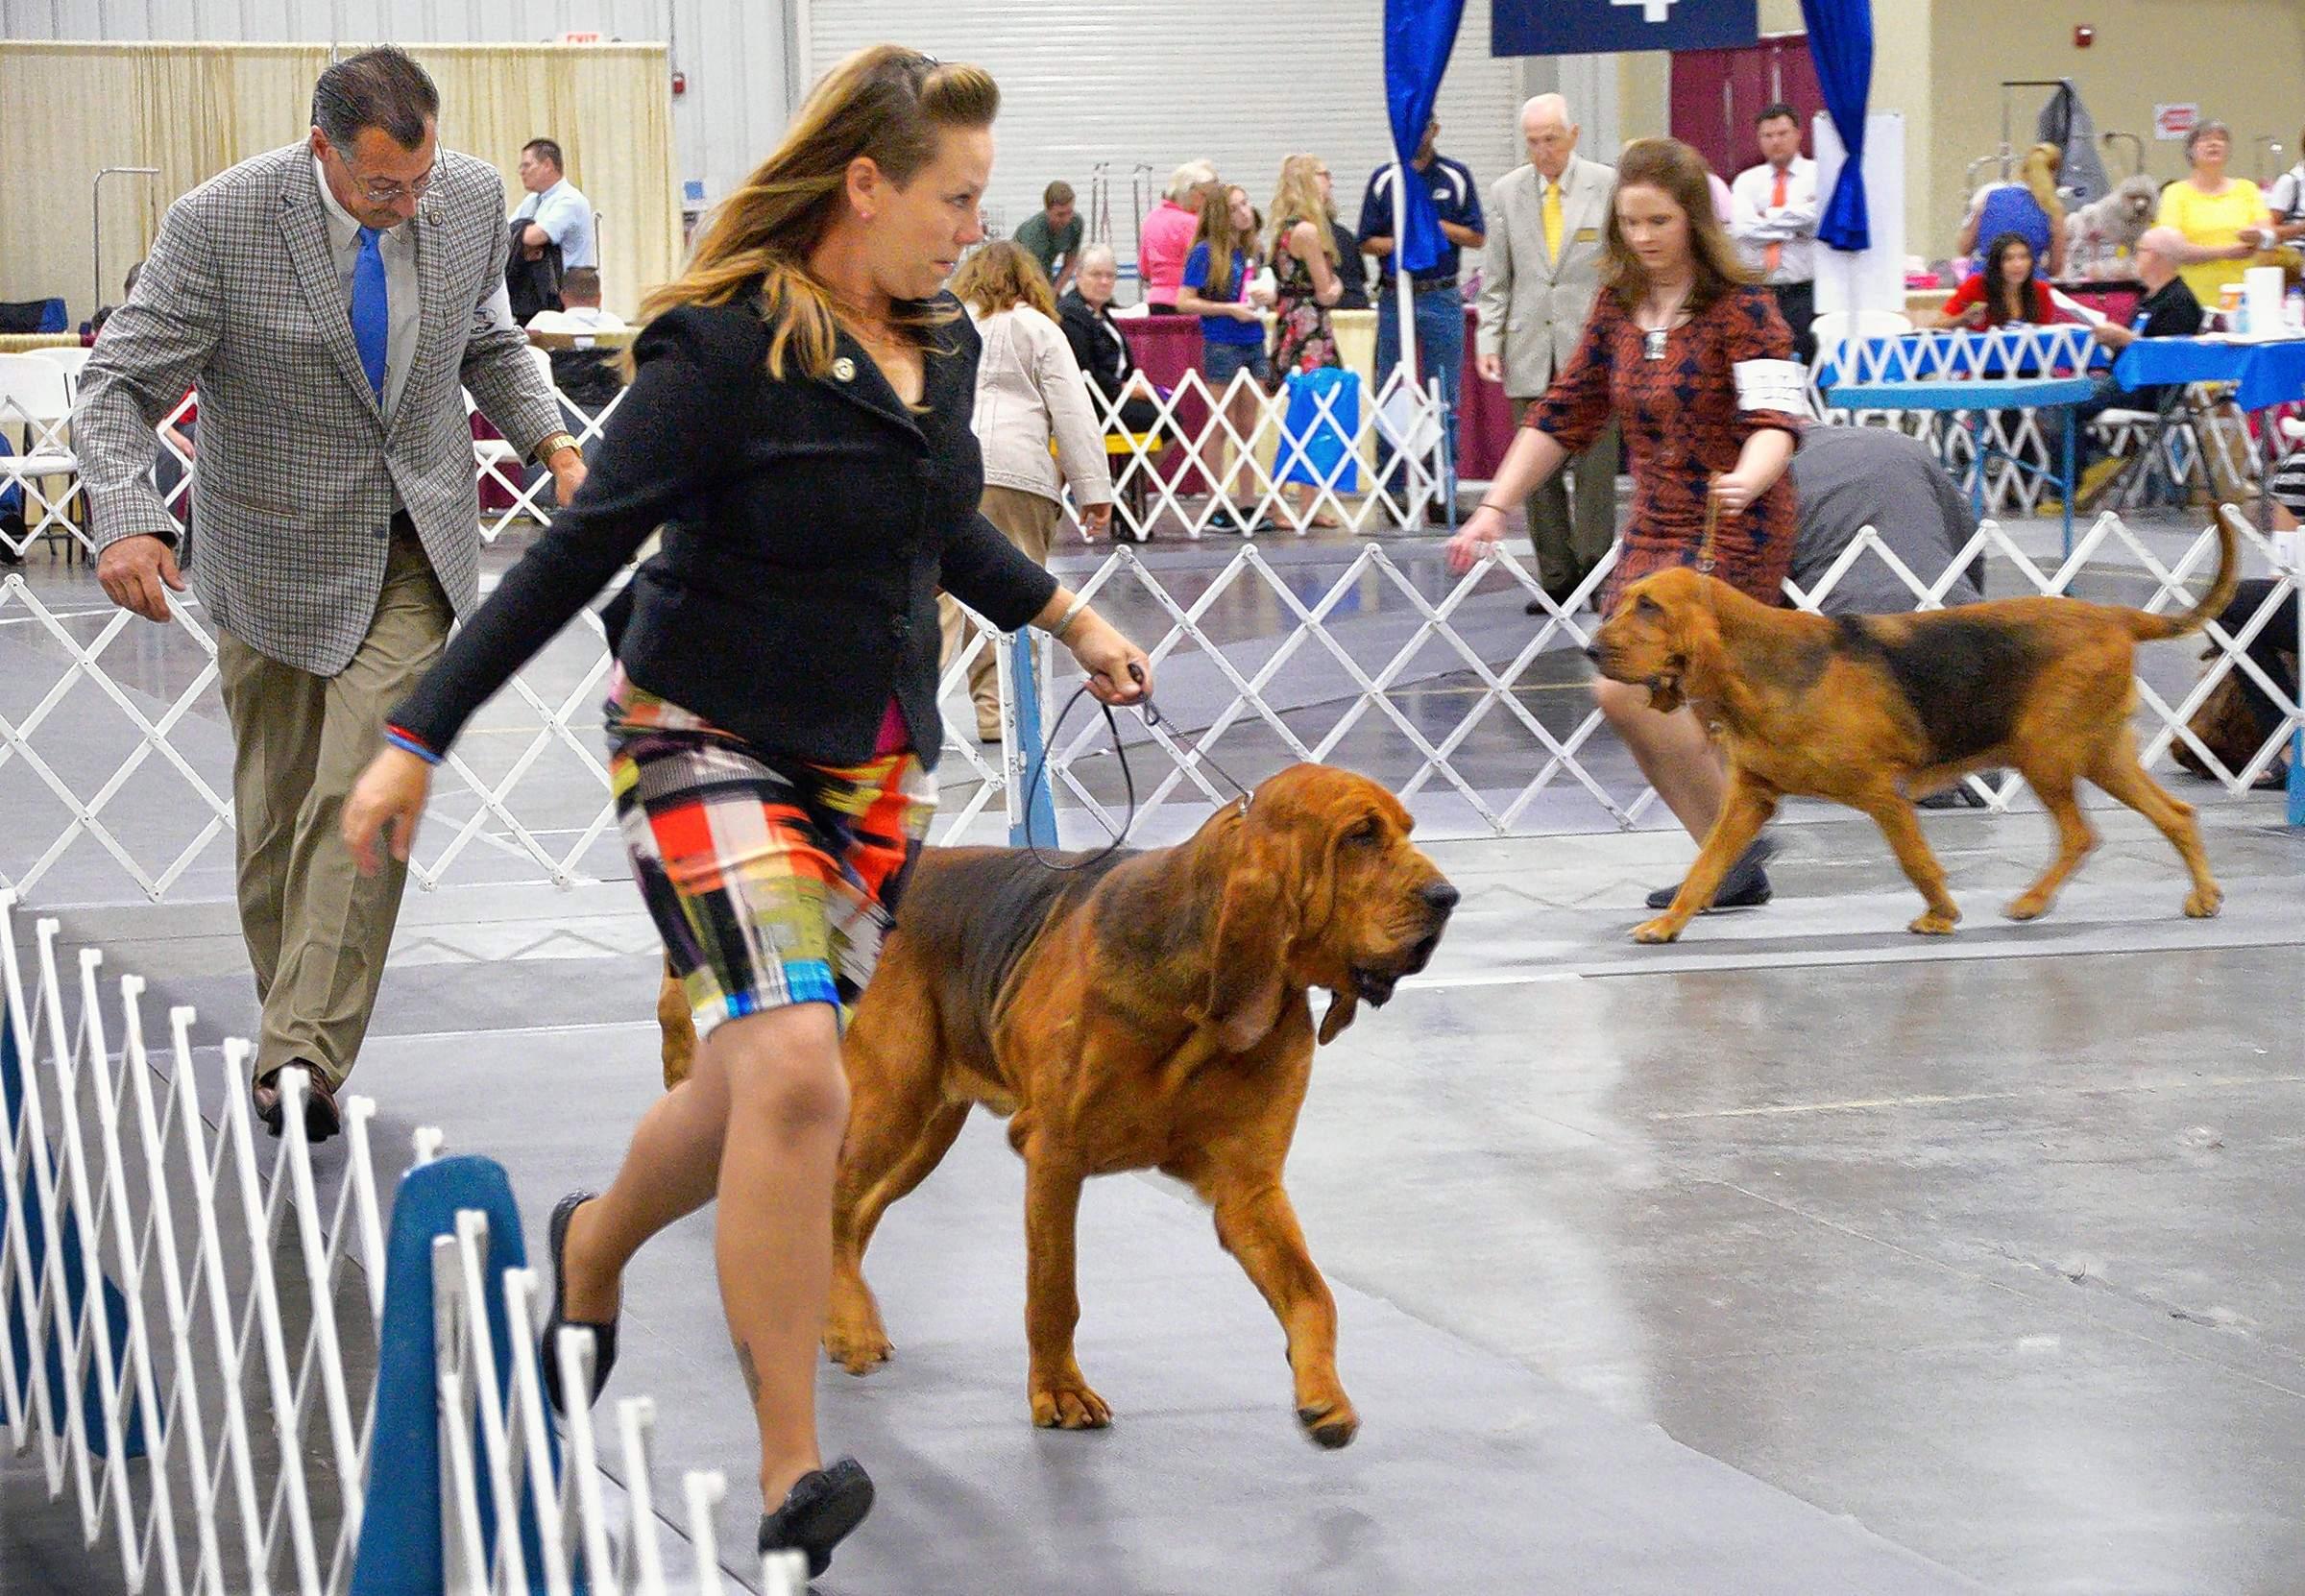 Trainer Danielle Frykman of Beach Park, Illinois, runs a bloodhound named Santana around a show ring. Santana lives in North Carolina.